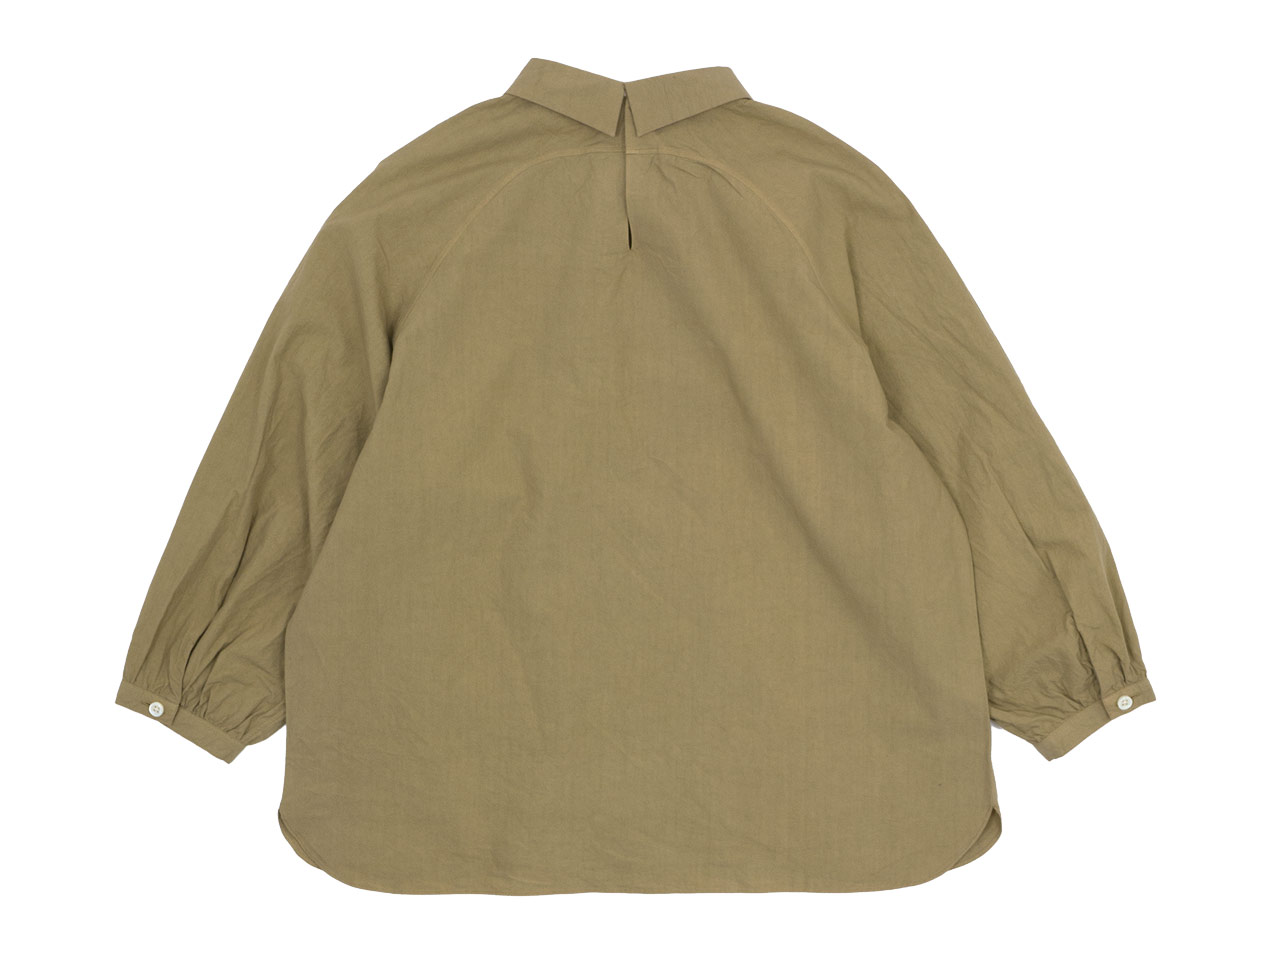 maillot mature rub cotton polo smock shirts